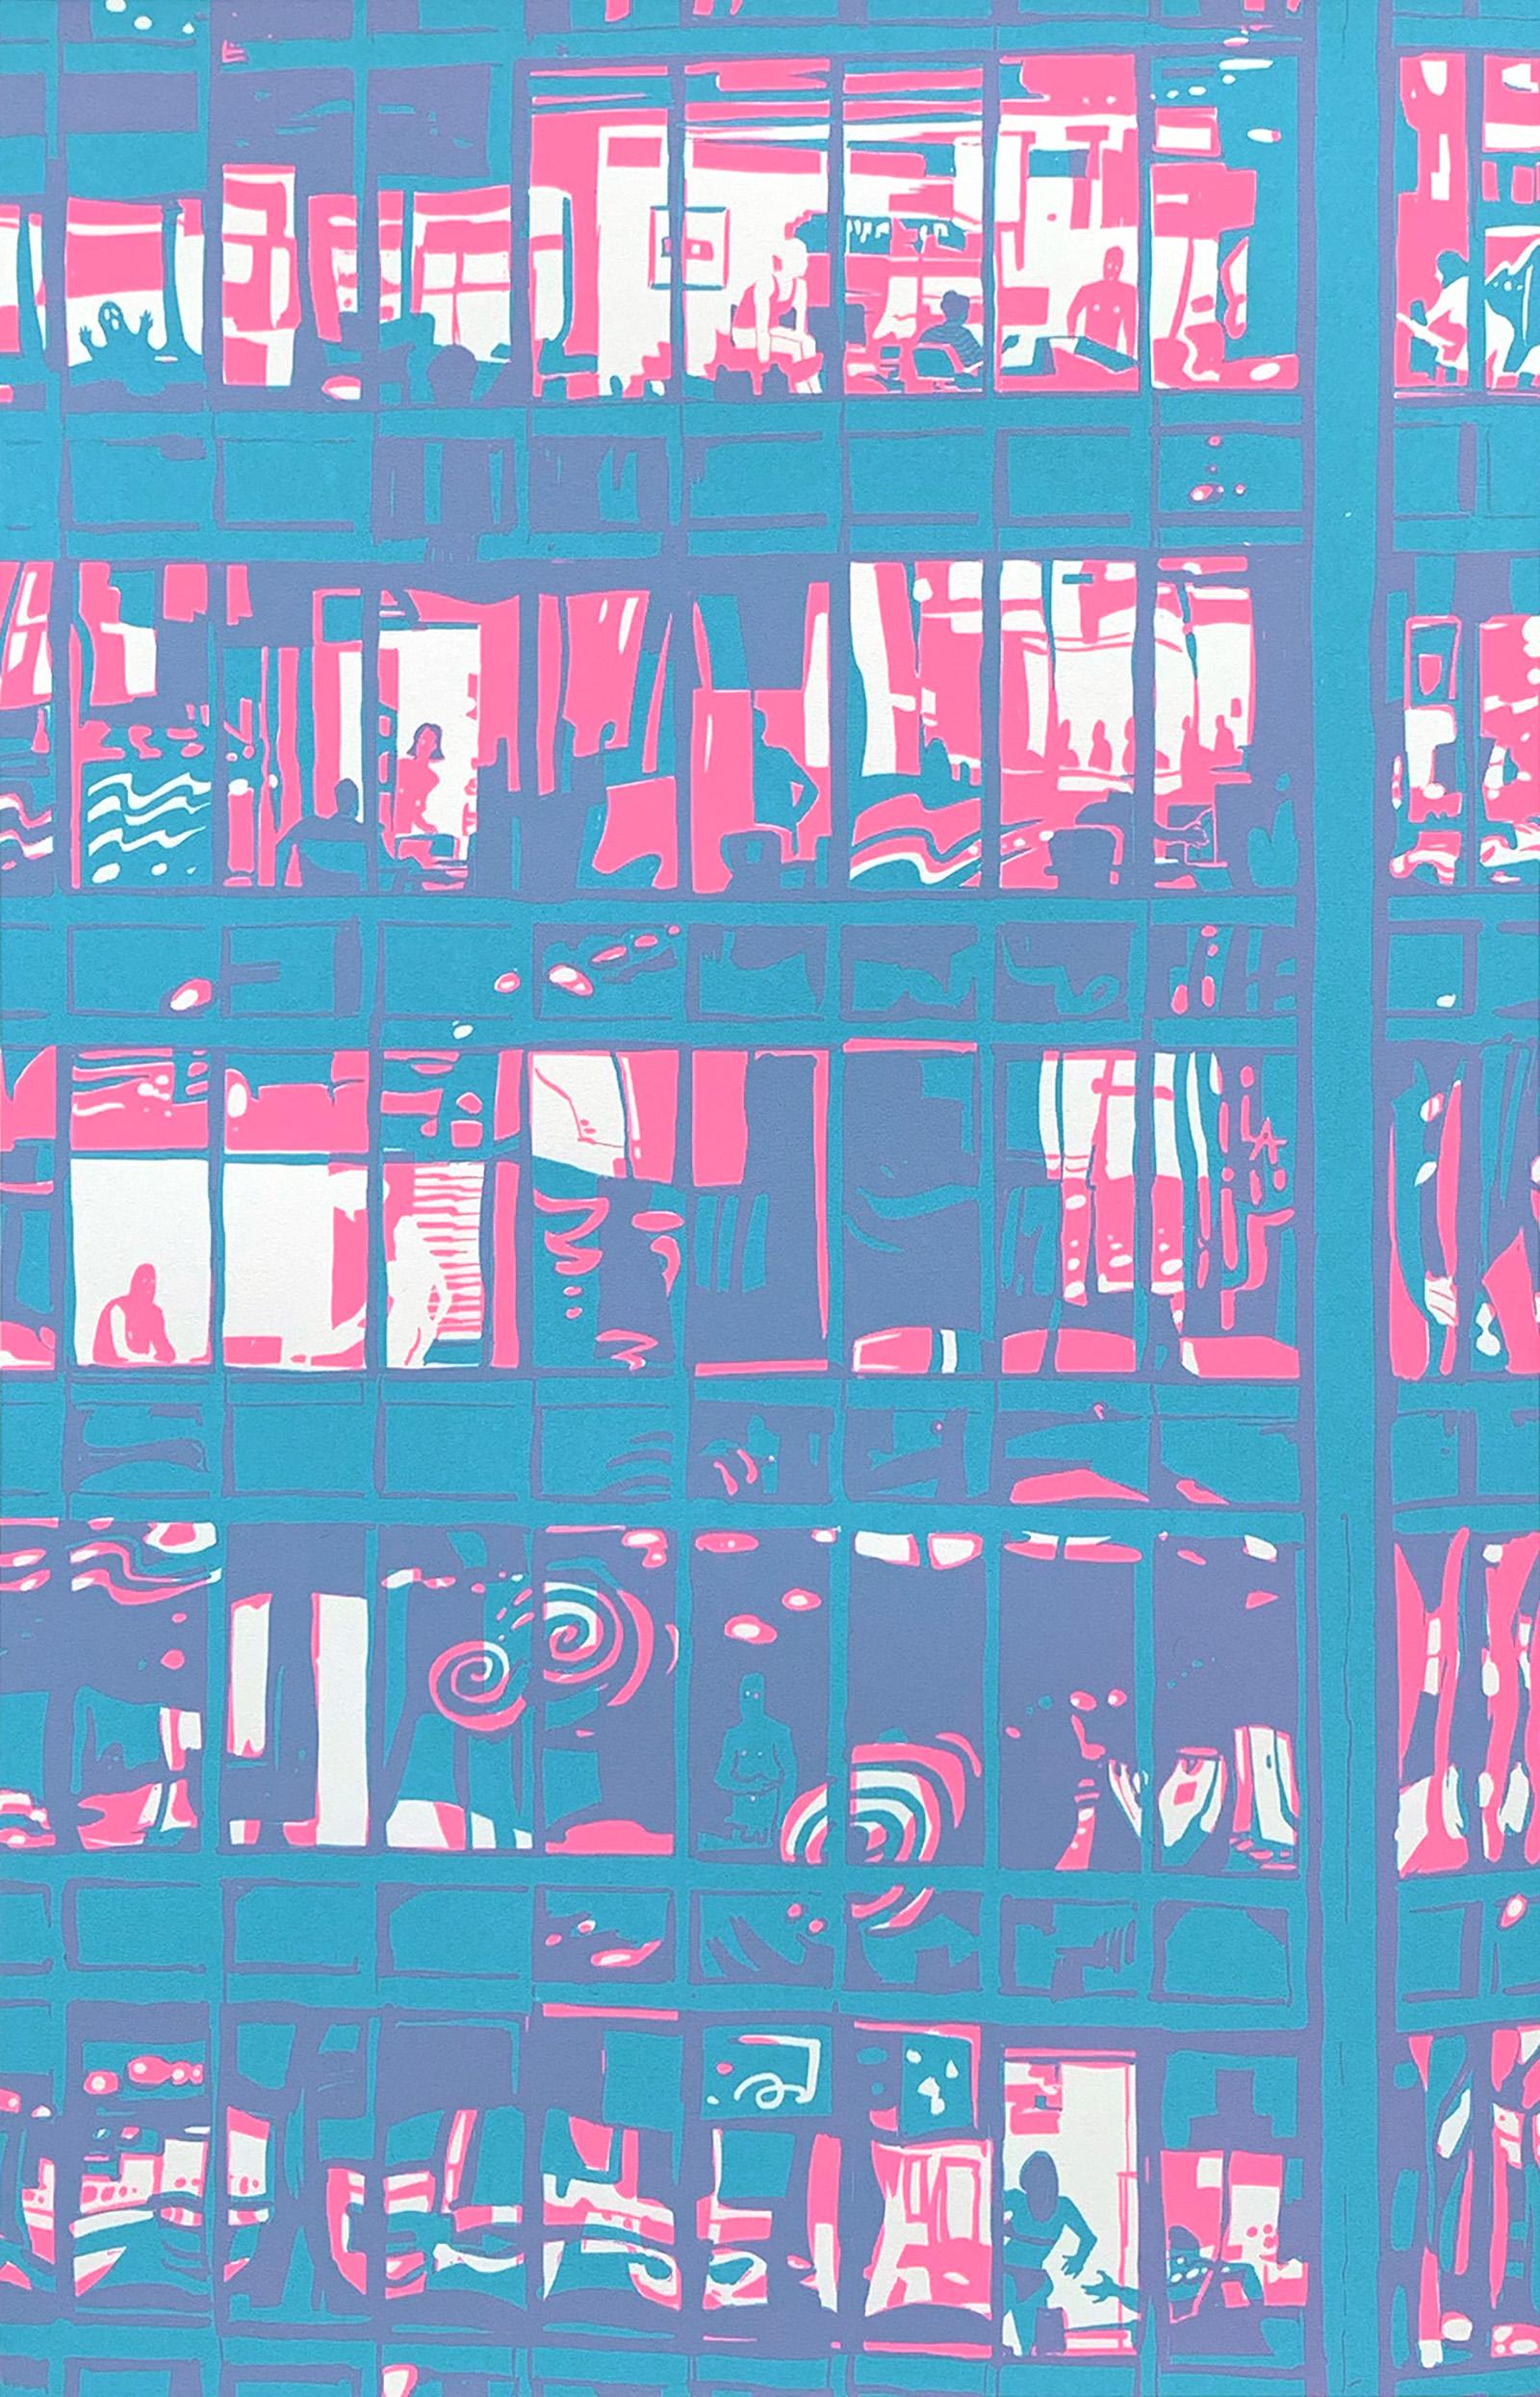 pinkandblue_dawn_crop2w.jpg